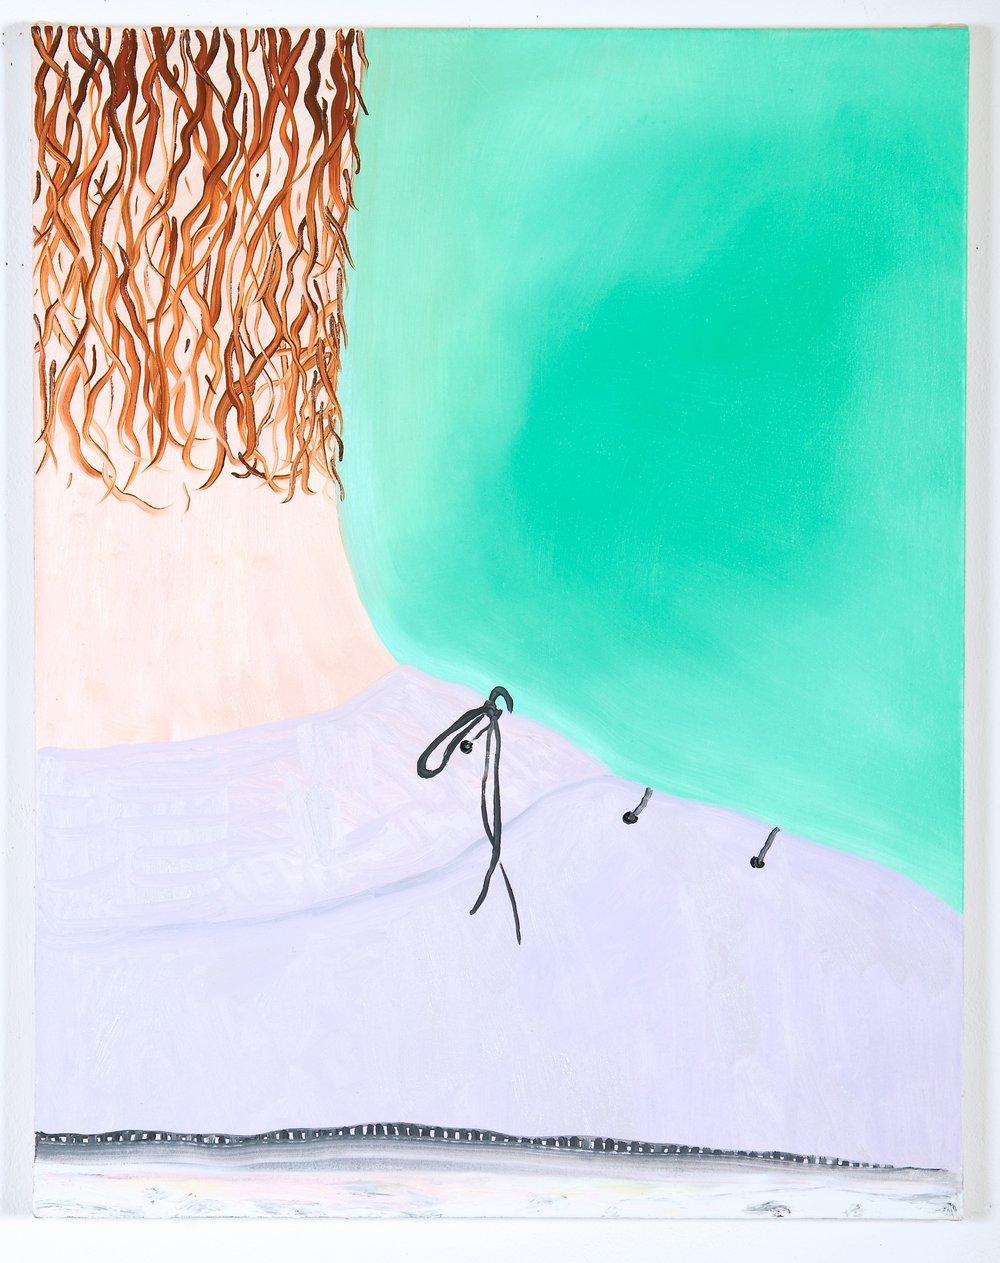 Beastly , oil on canvas, 60 x 50 cm, 2018